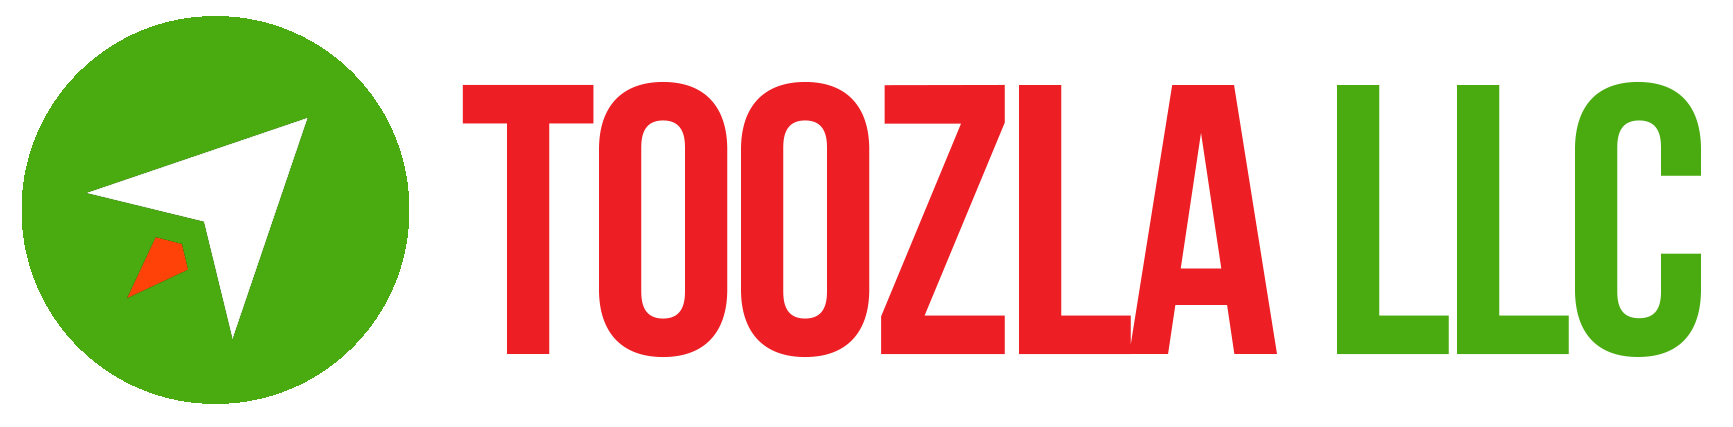 Toozla LLC